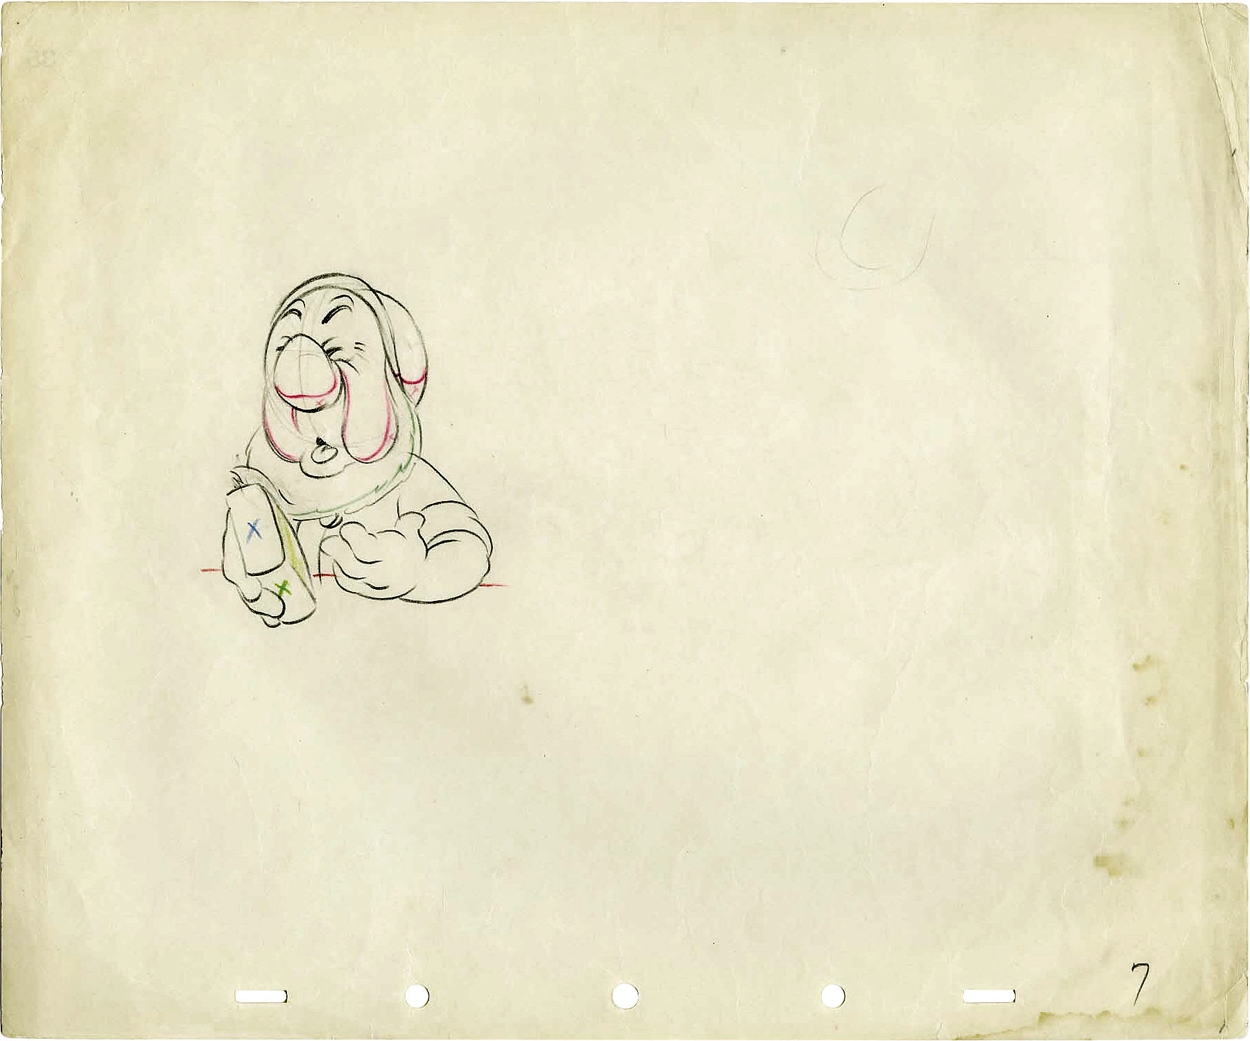 Walt Disney Studios - Snow White and the Seven Dwarfs Pencil